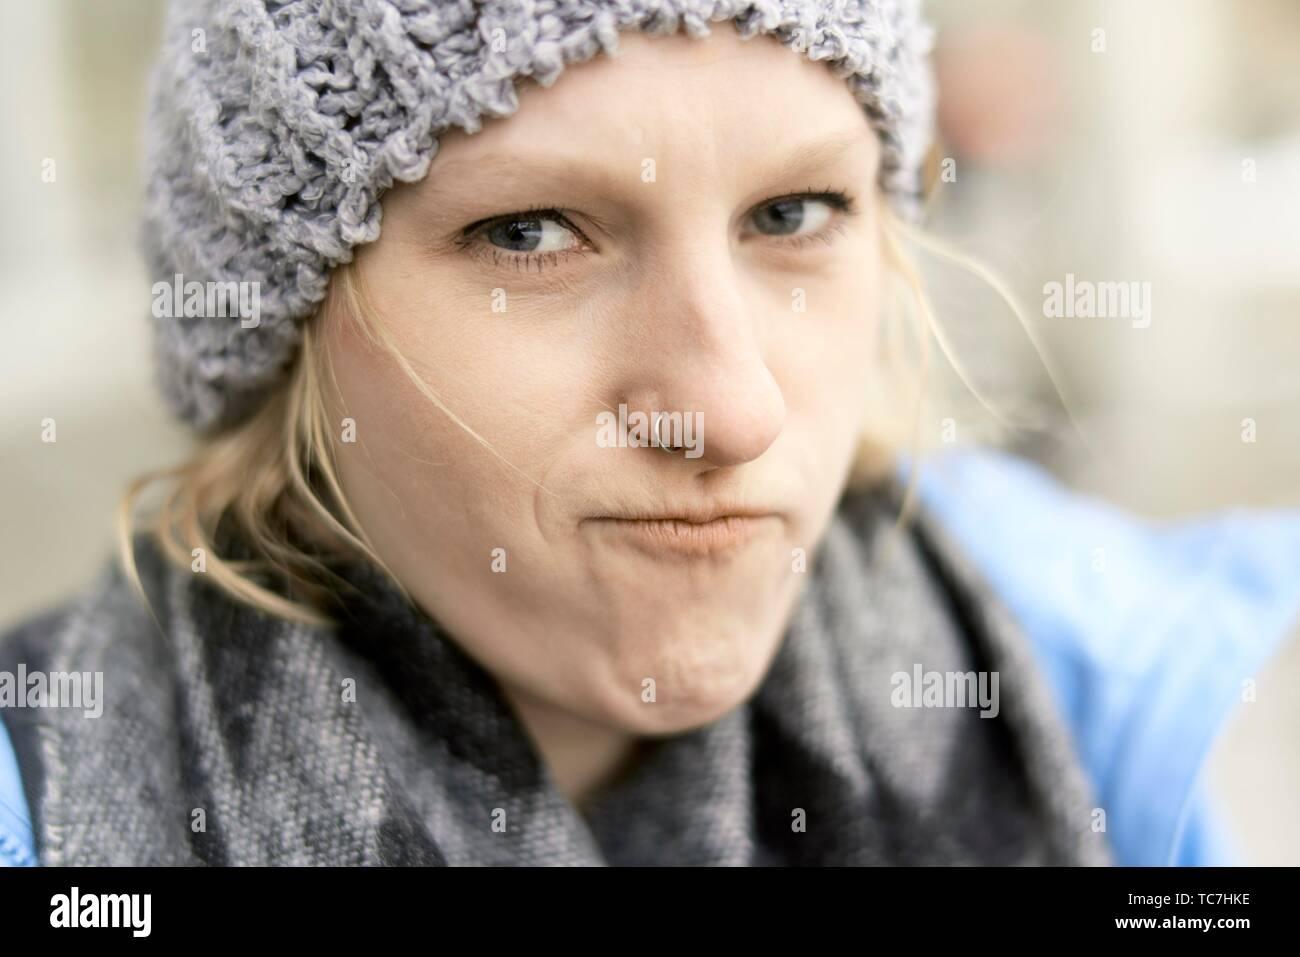 woman, in Munich, Germany. Stock Photo